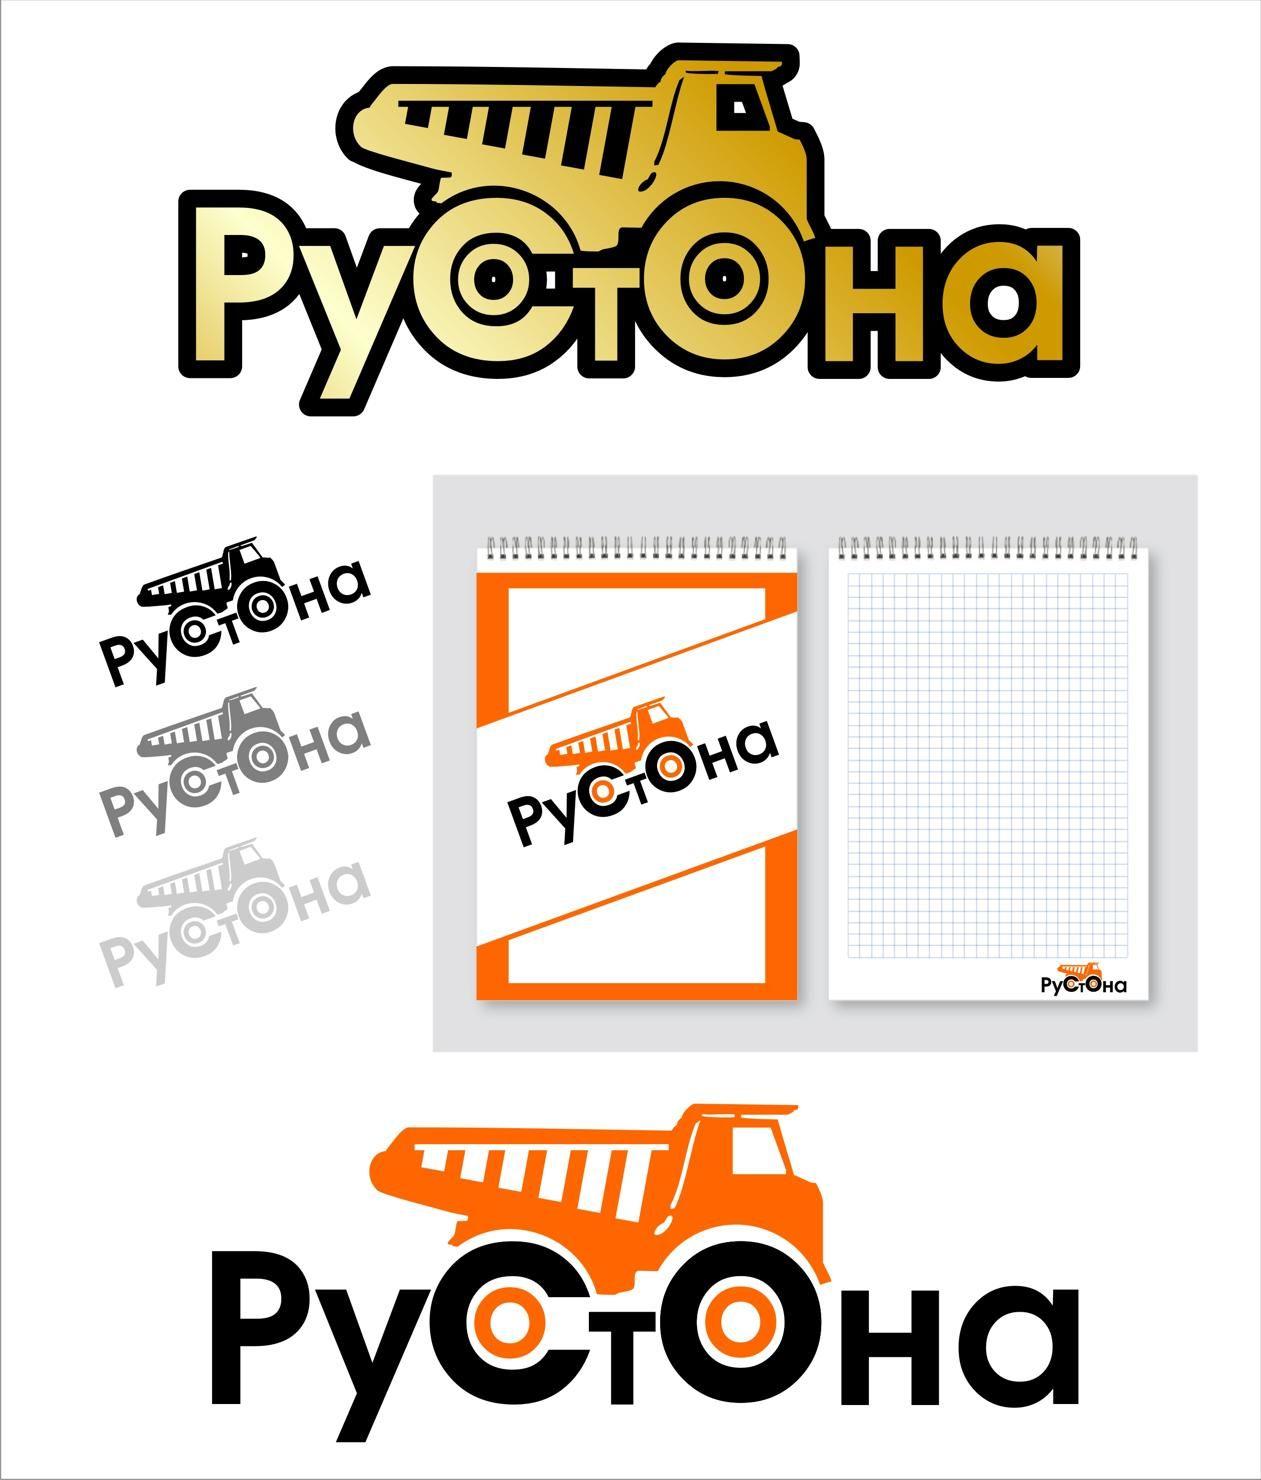 Логотип для компании Рустона (www.rustona.com) - дизайнер annare